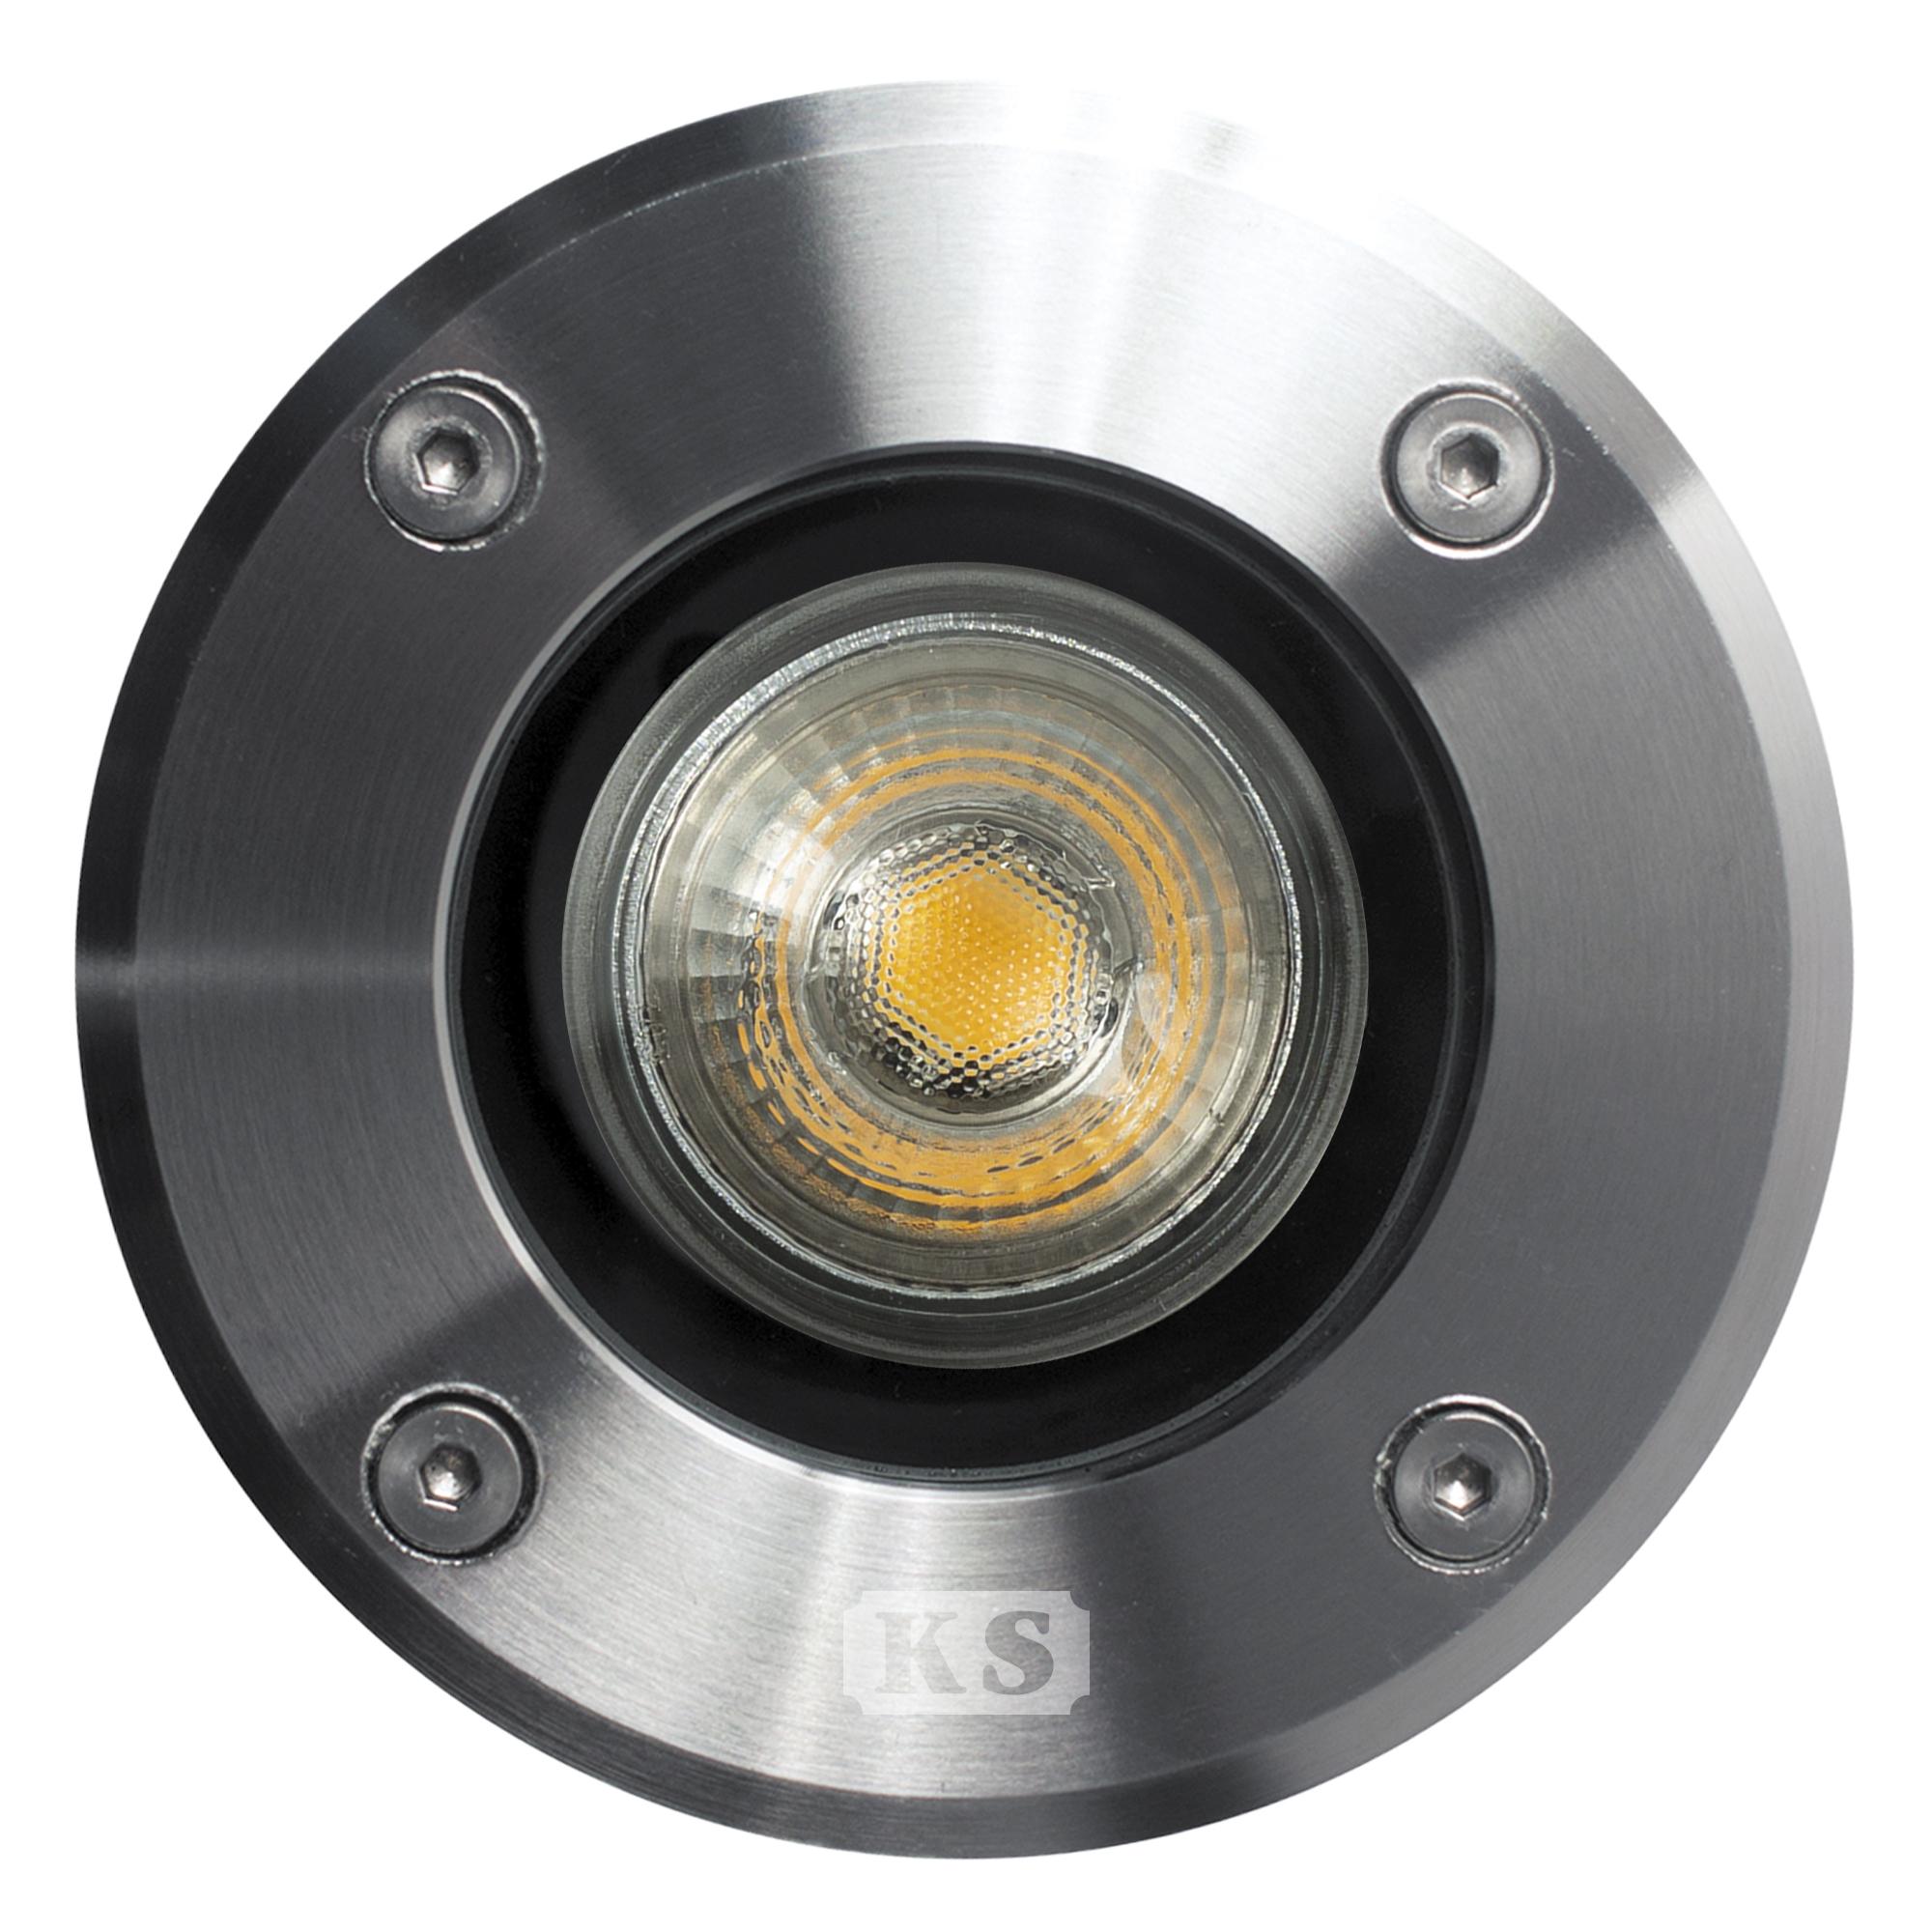 Grondspot LED Ø11 Rond RVS